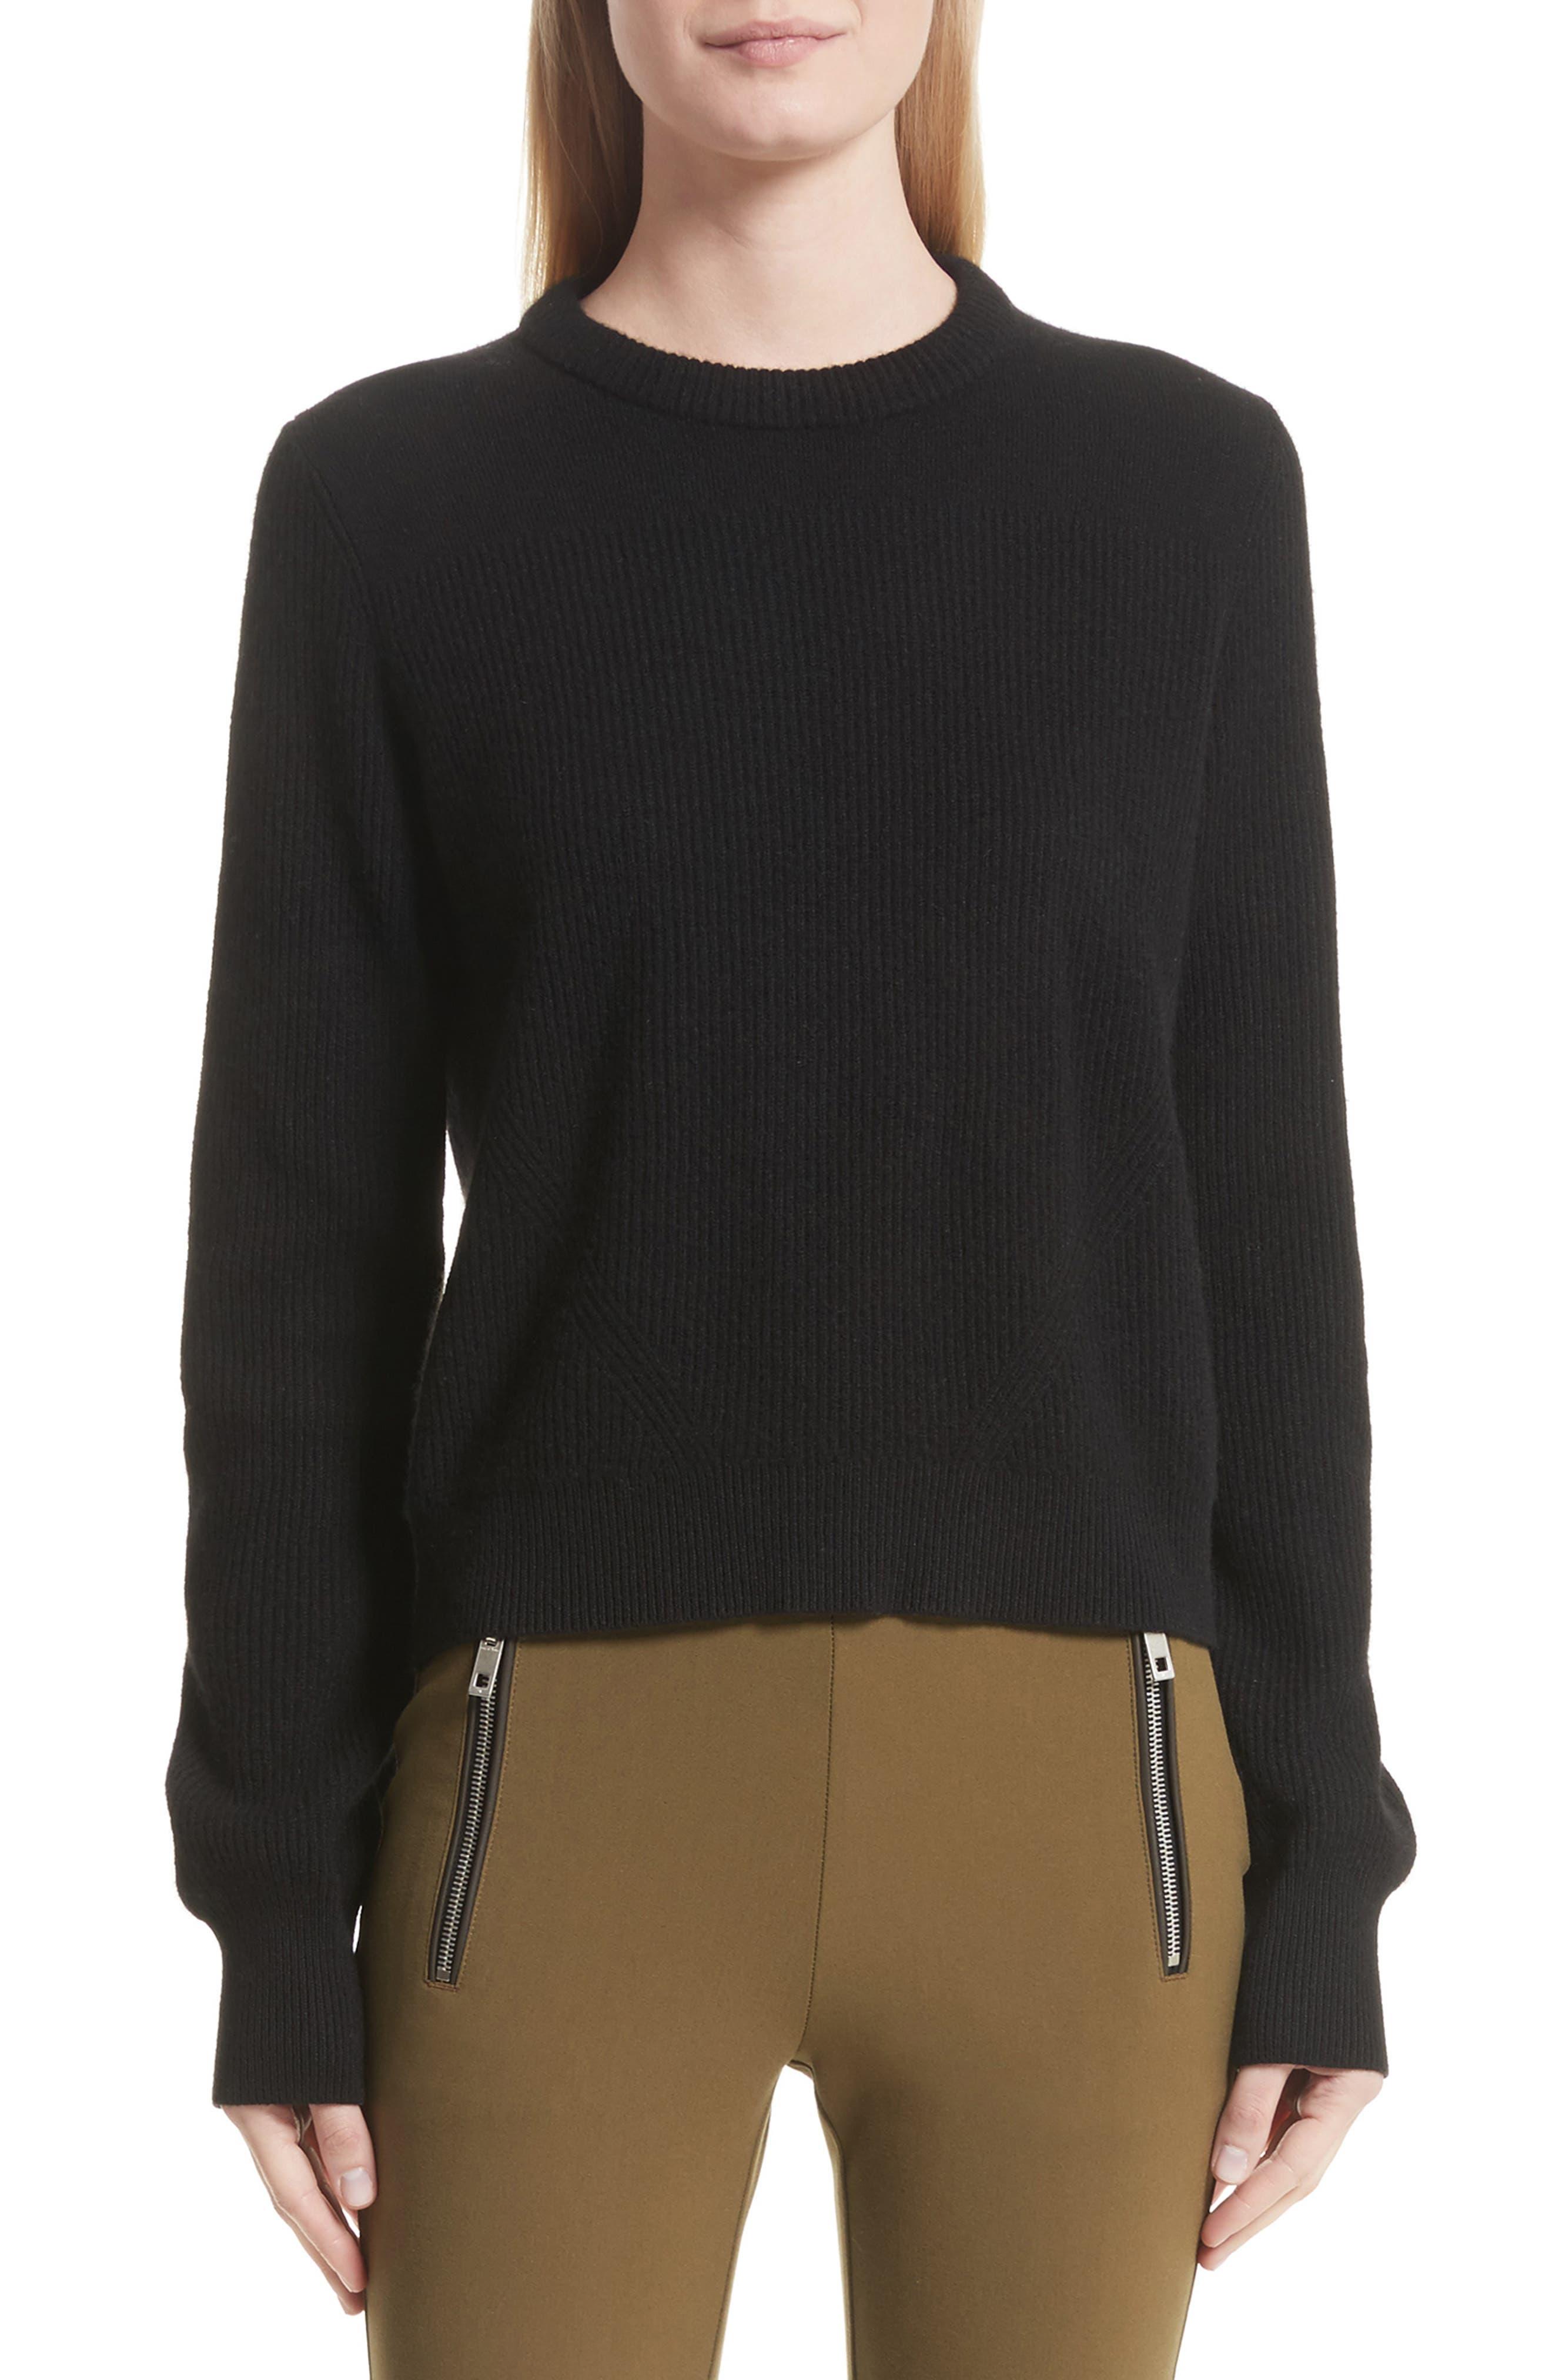 Ace Cashmere Crop Sweater,                             Main thumbnail 1, color,                             001